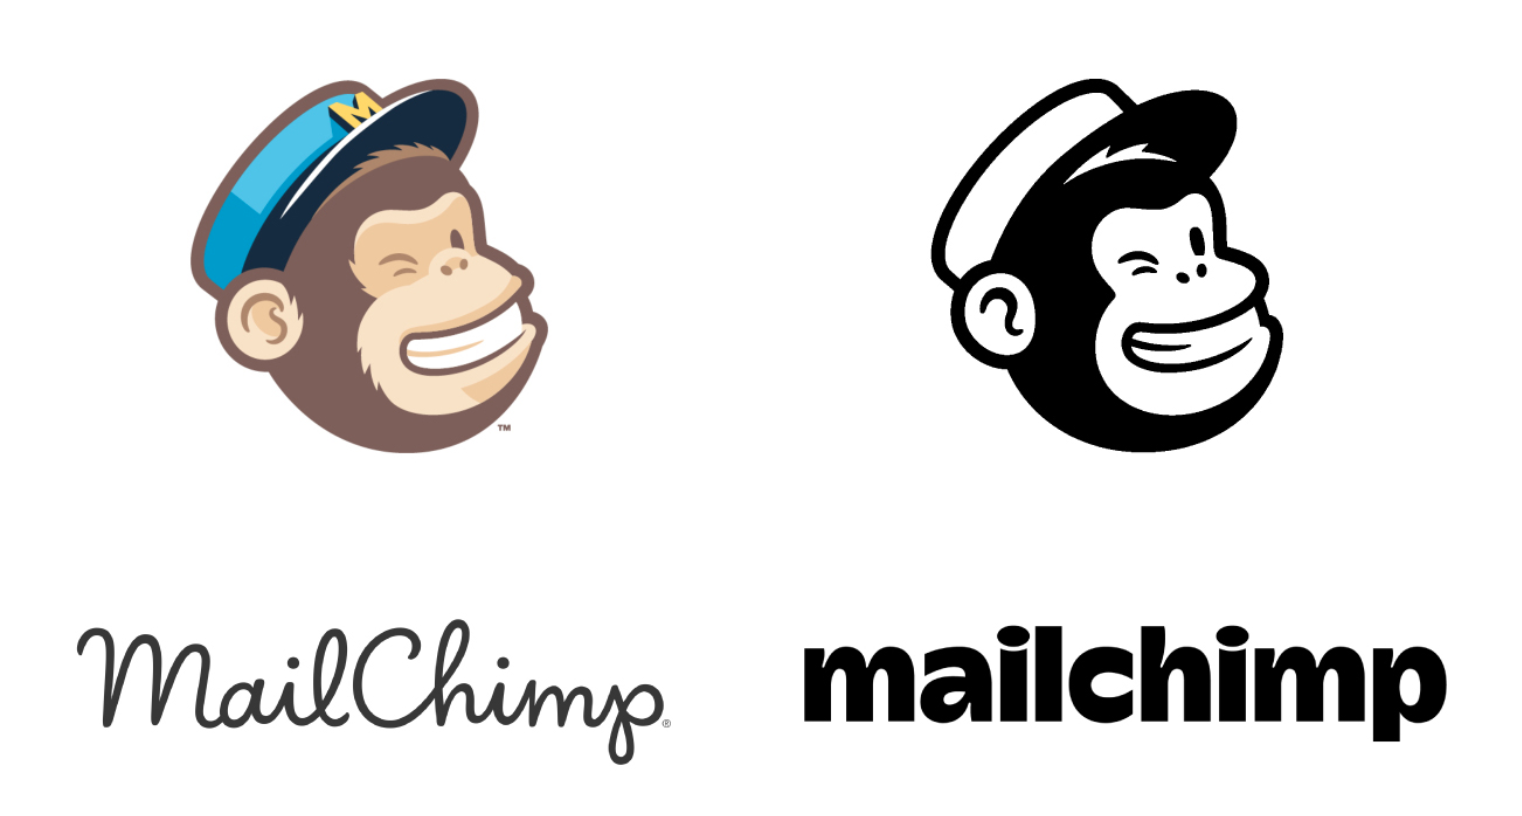 Mailchimp: i loghi prima e dopo il rebranding